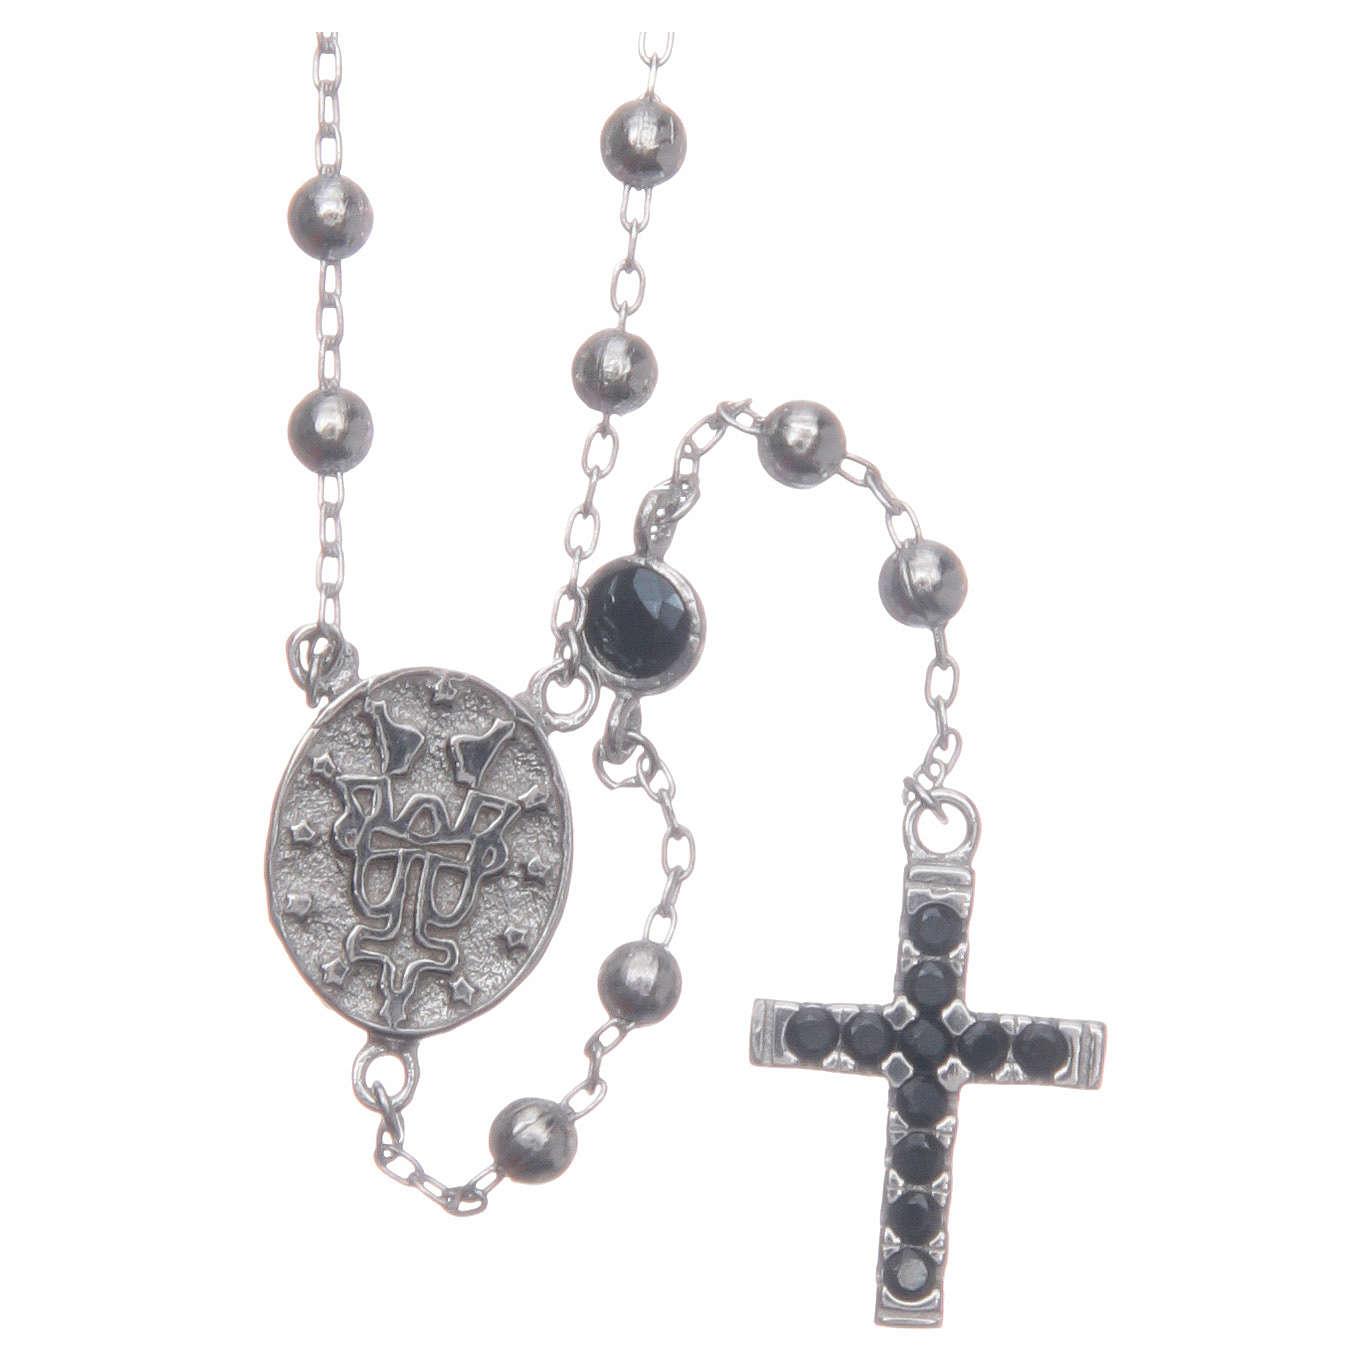 Rosario classico Santa Rita silver zirconi neri argento 925 4